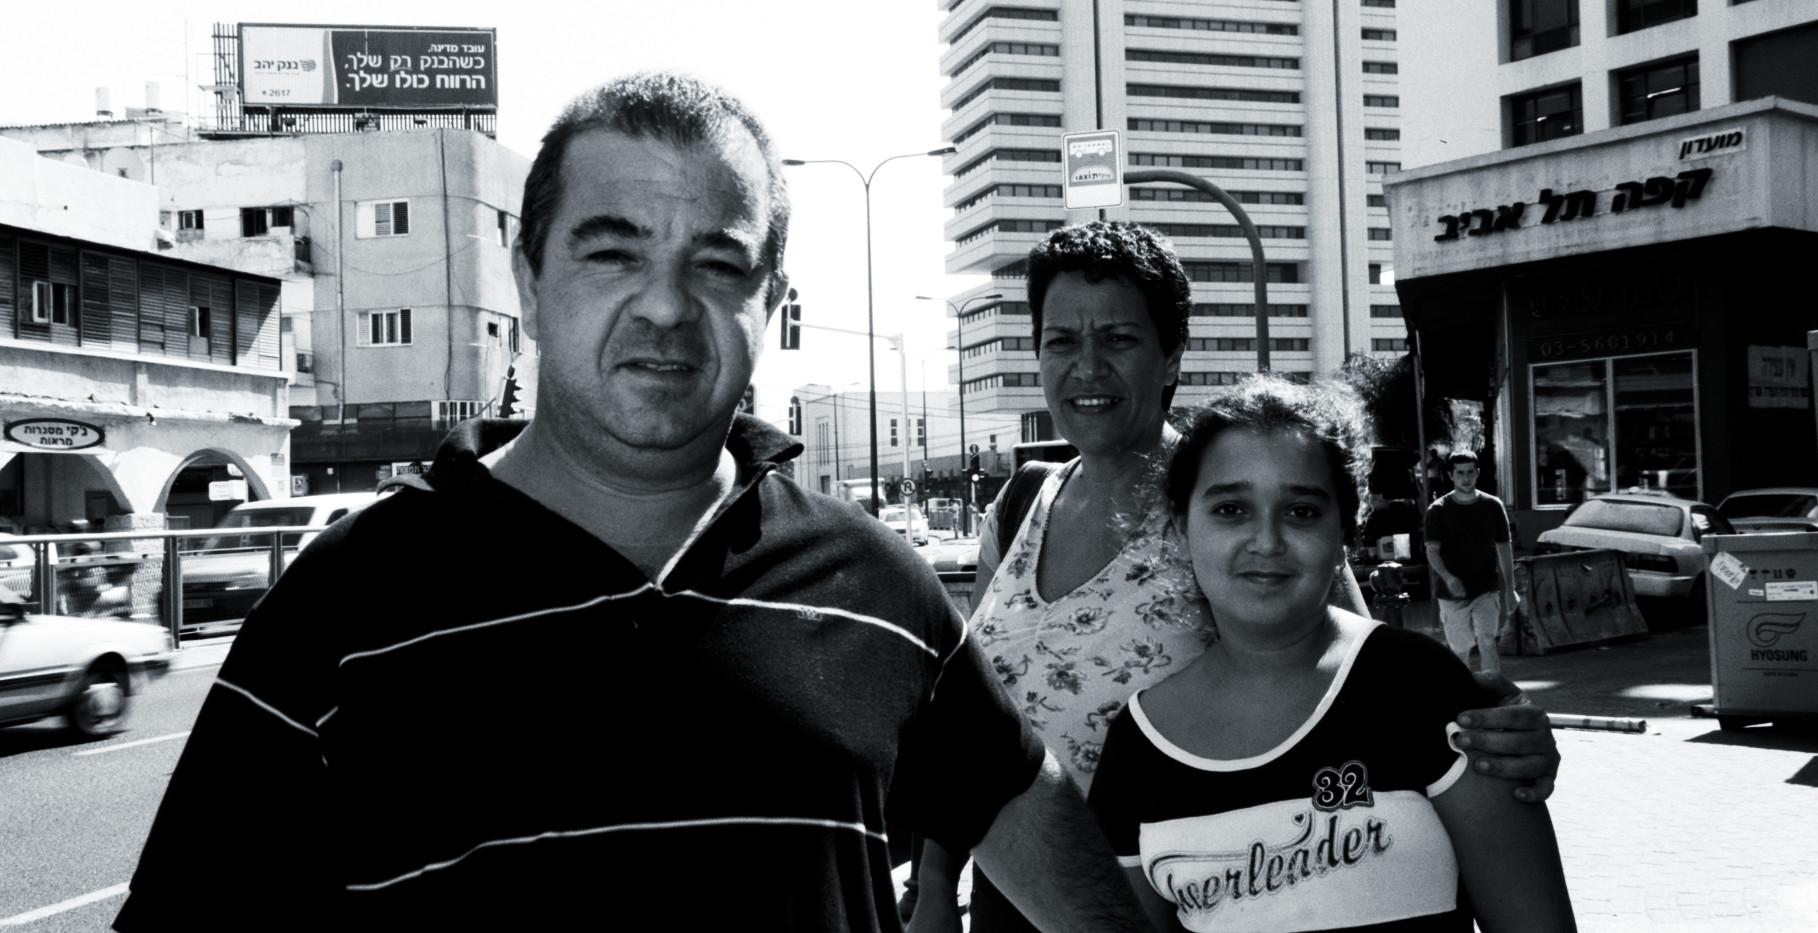 Israel, 2005